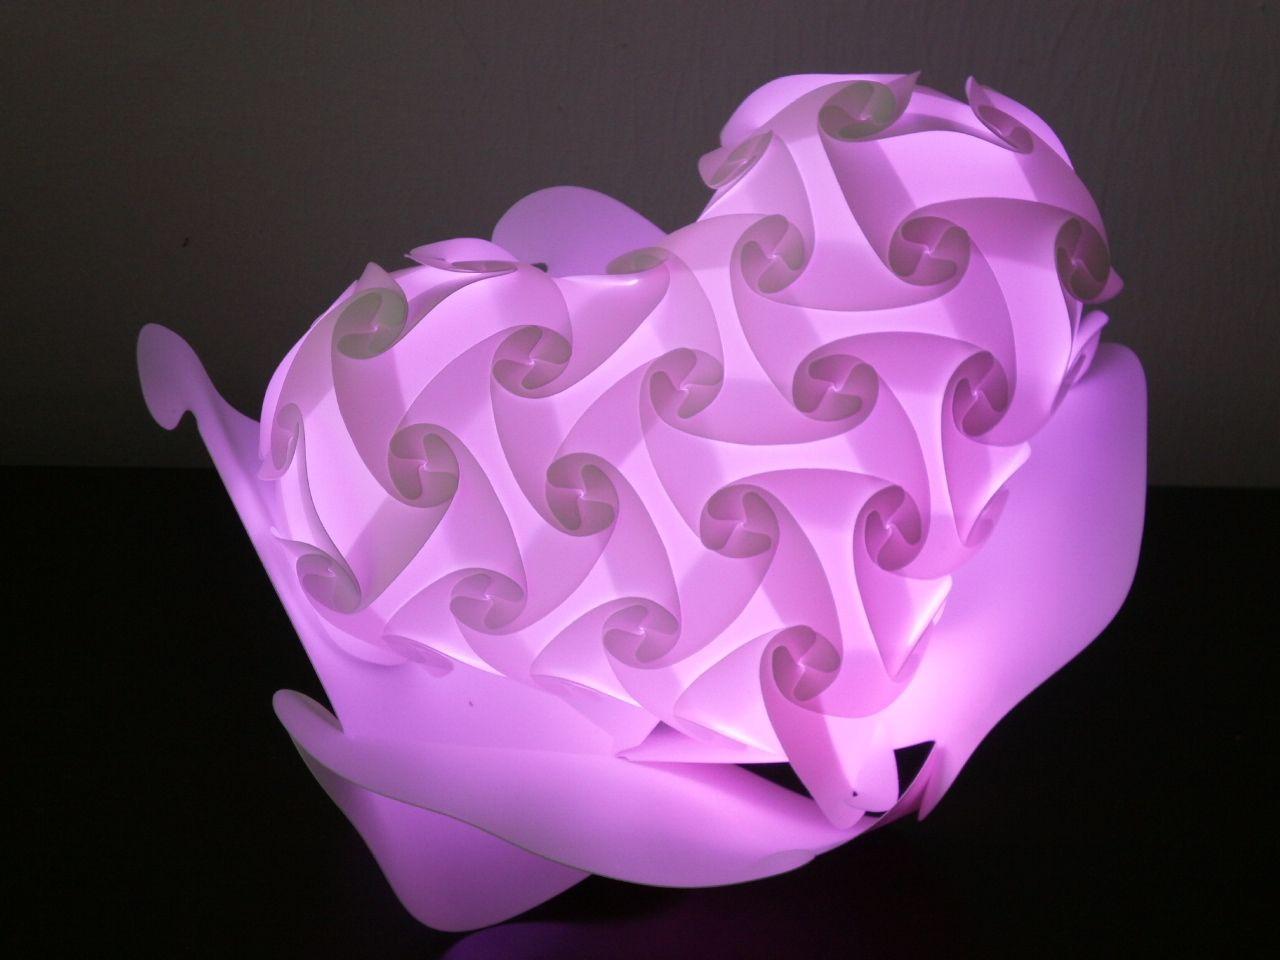 Puzzle Lamp Templates Google Search Puzzle Lights Lamp Love Shape